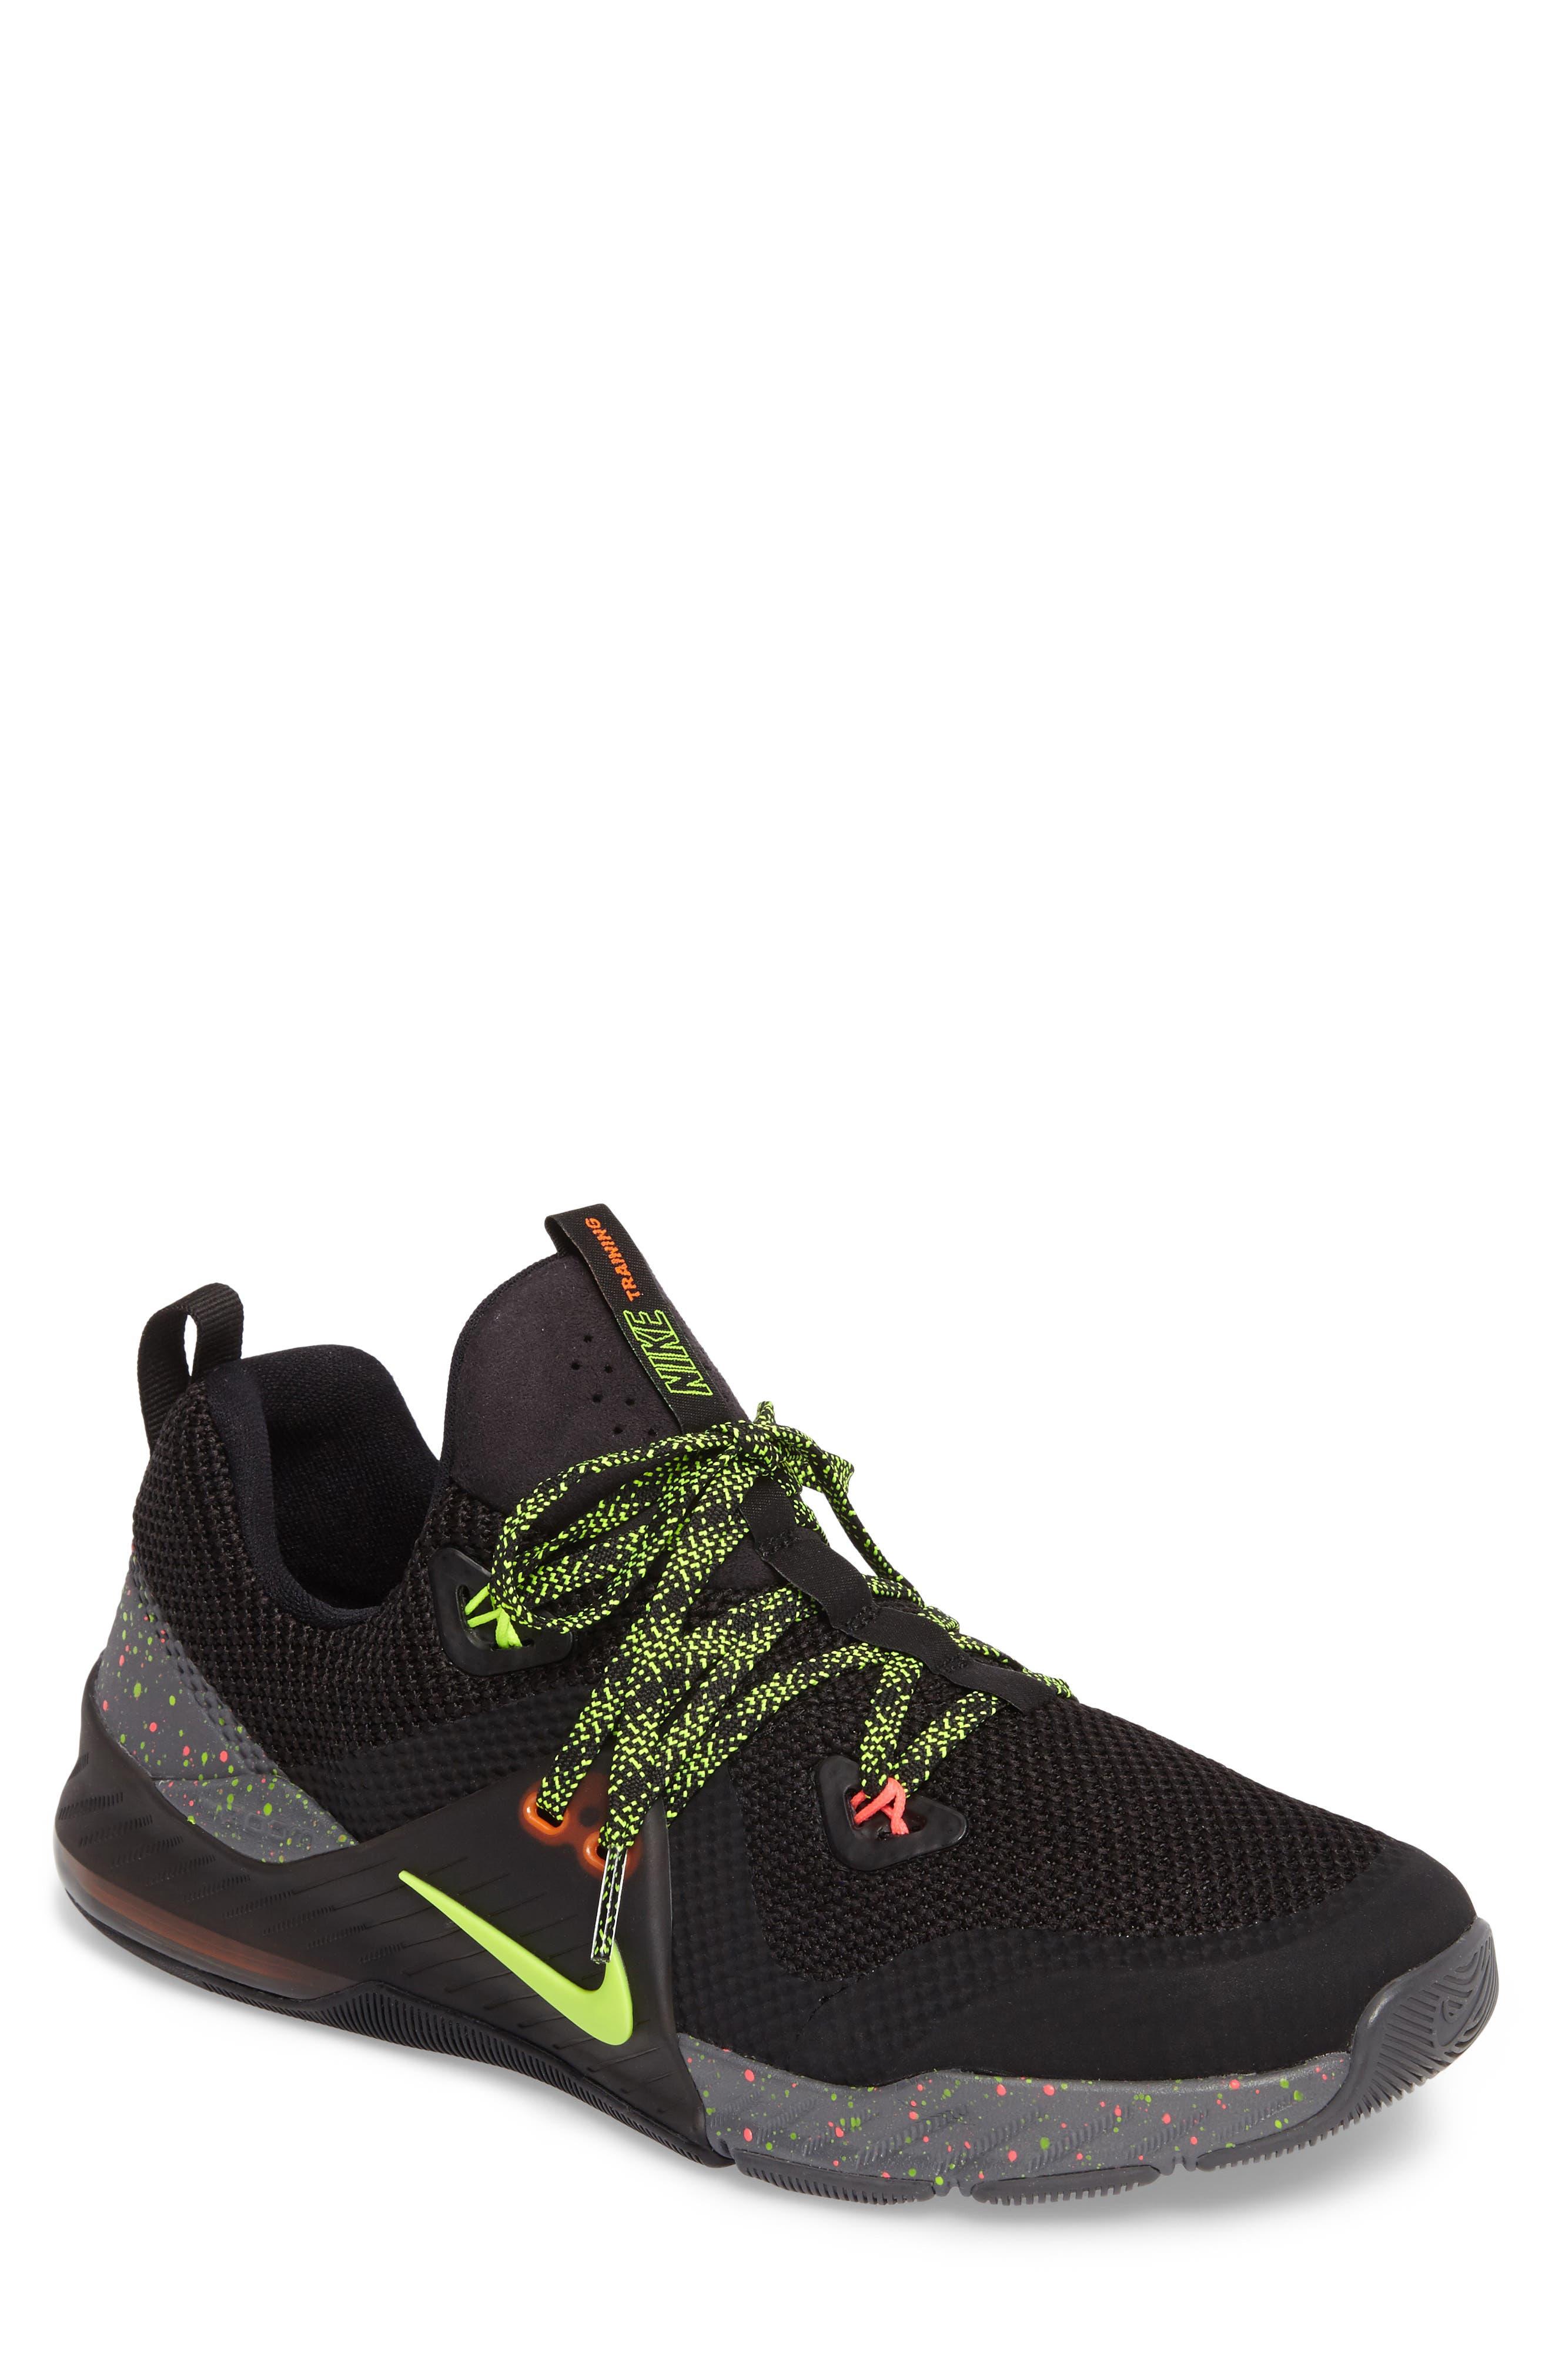 Main Image - Nike Zoom Train Command Running Shoe (Men)